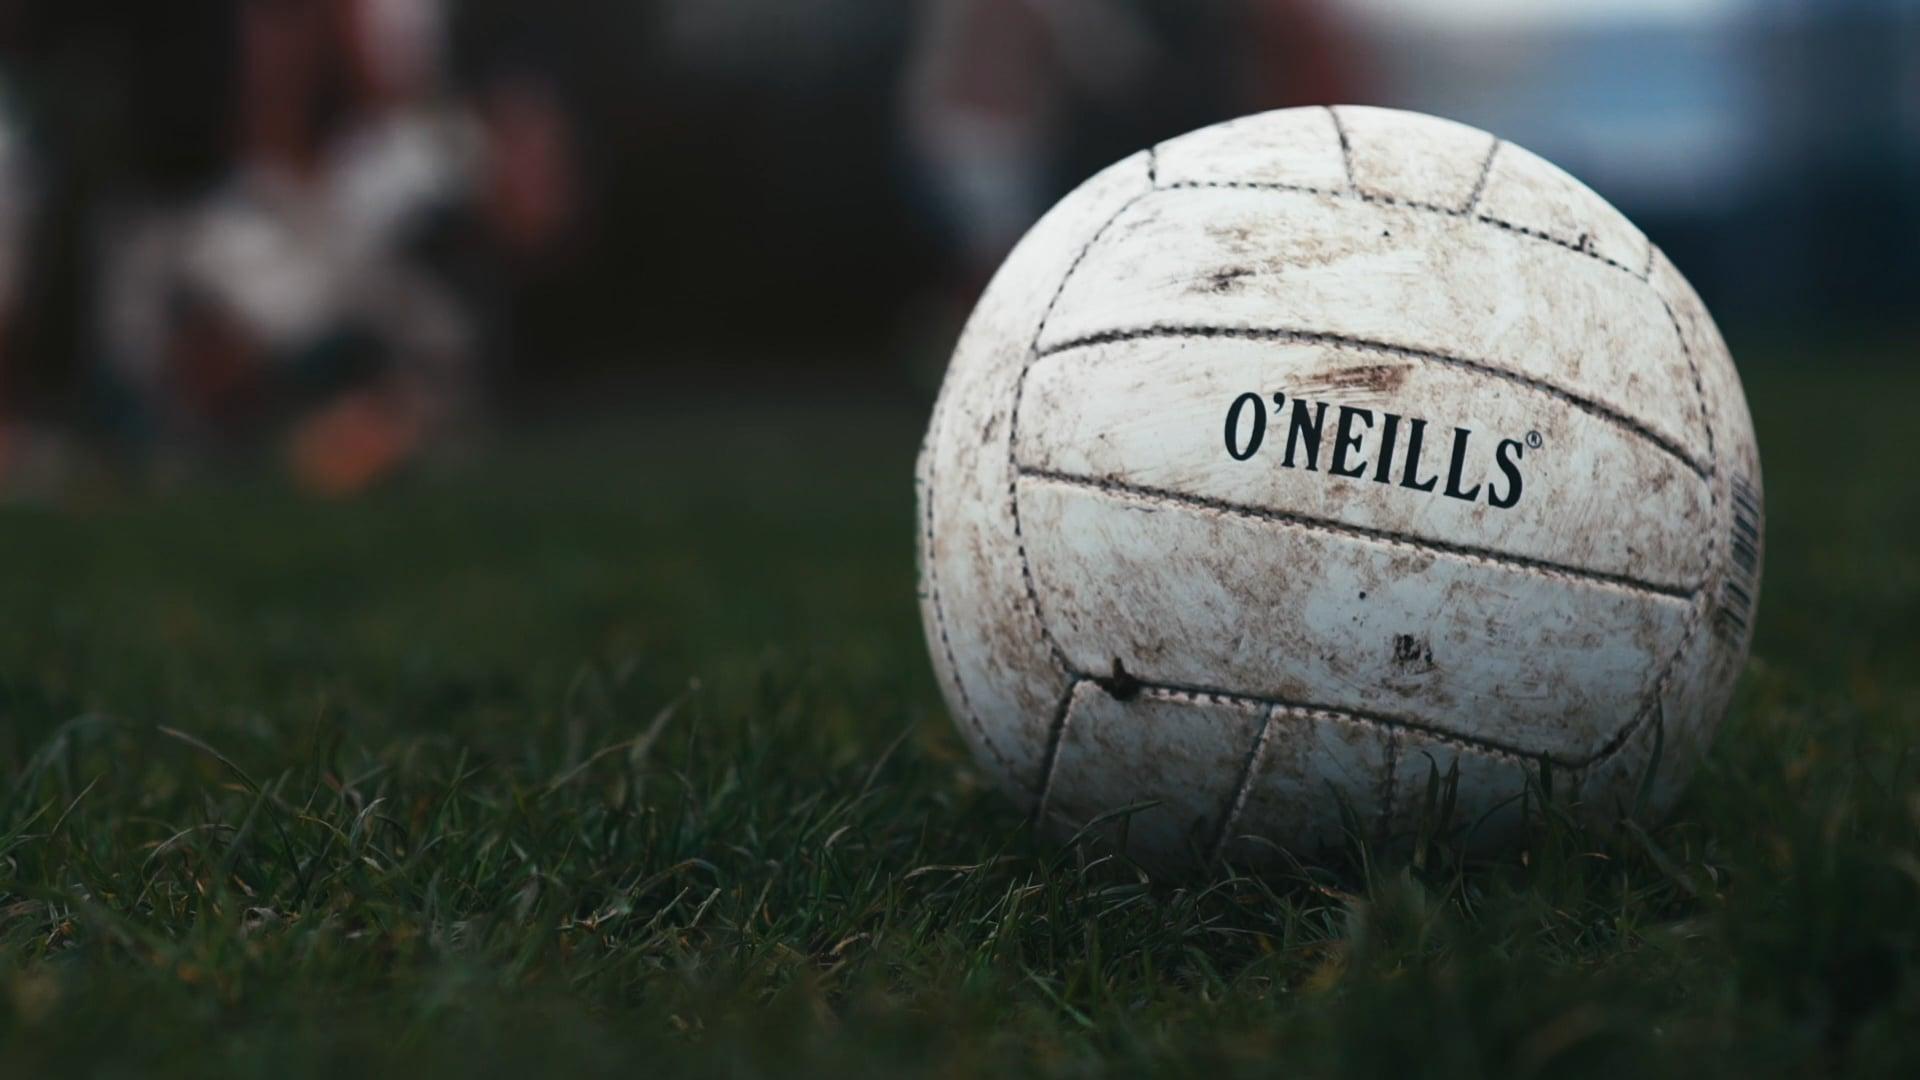 GAA: It's About More Than Just Sport - Kilcullen GAA